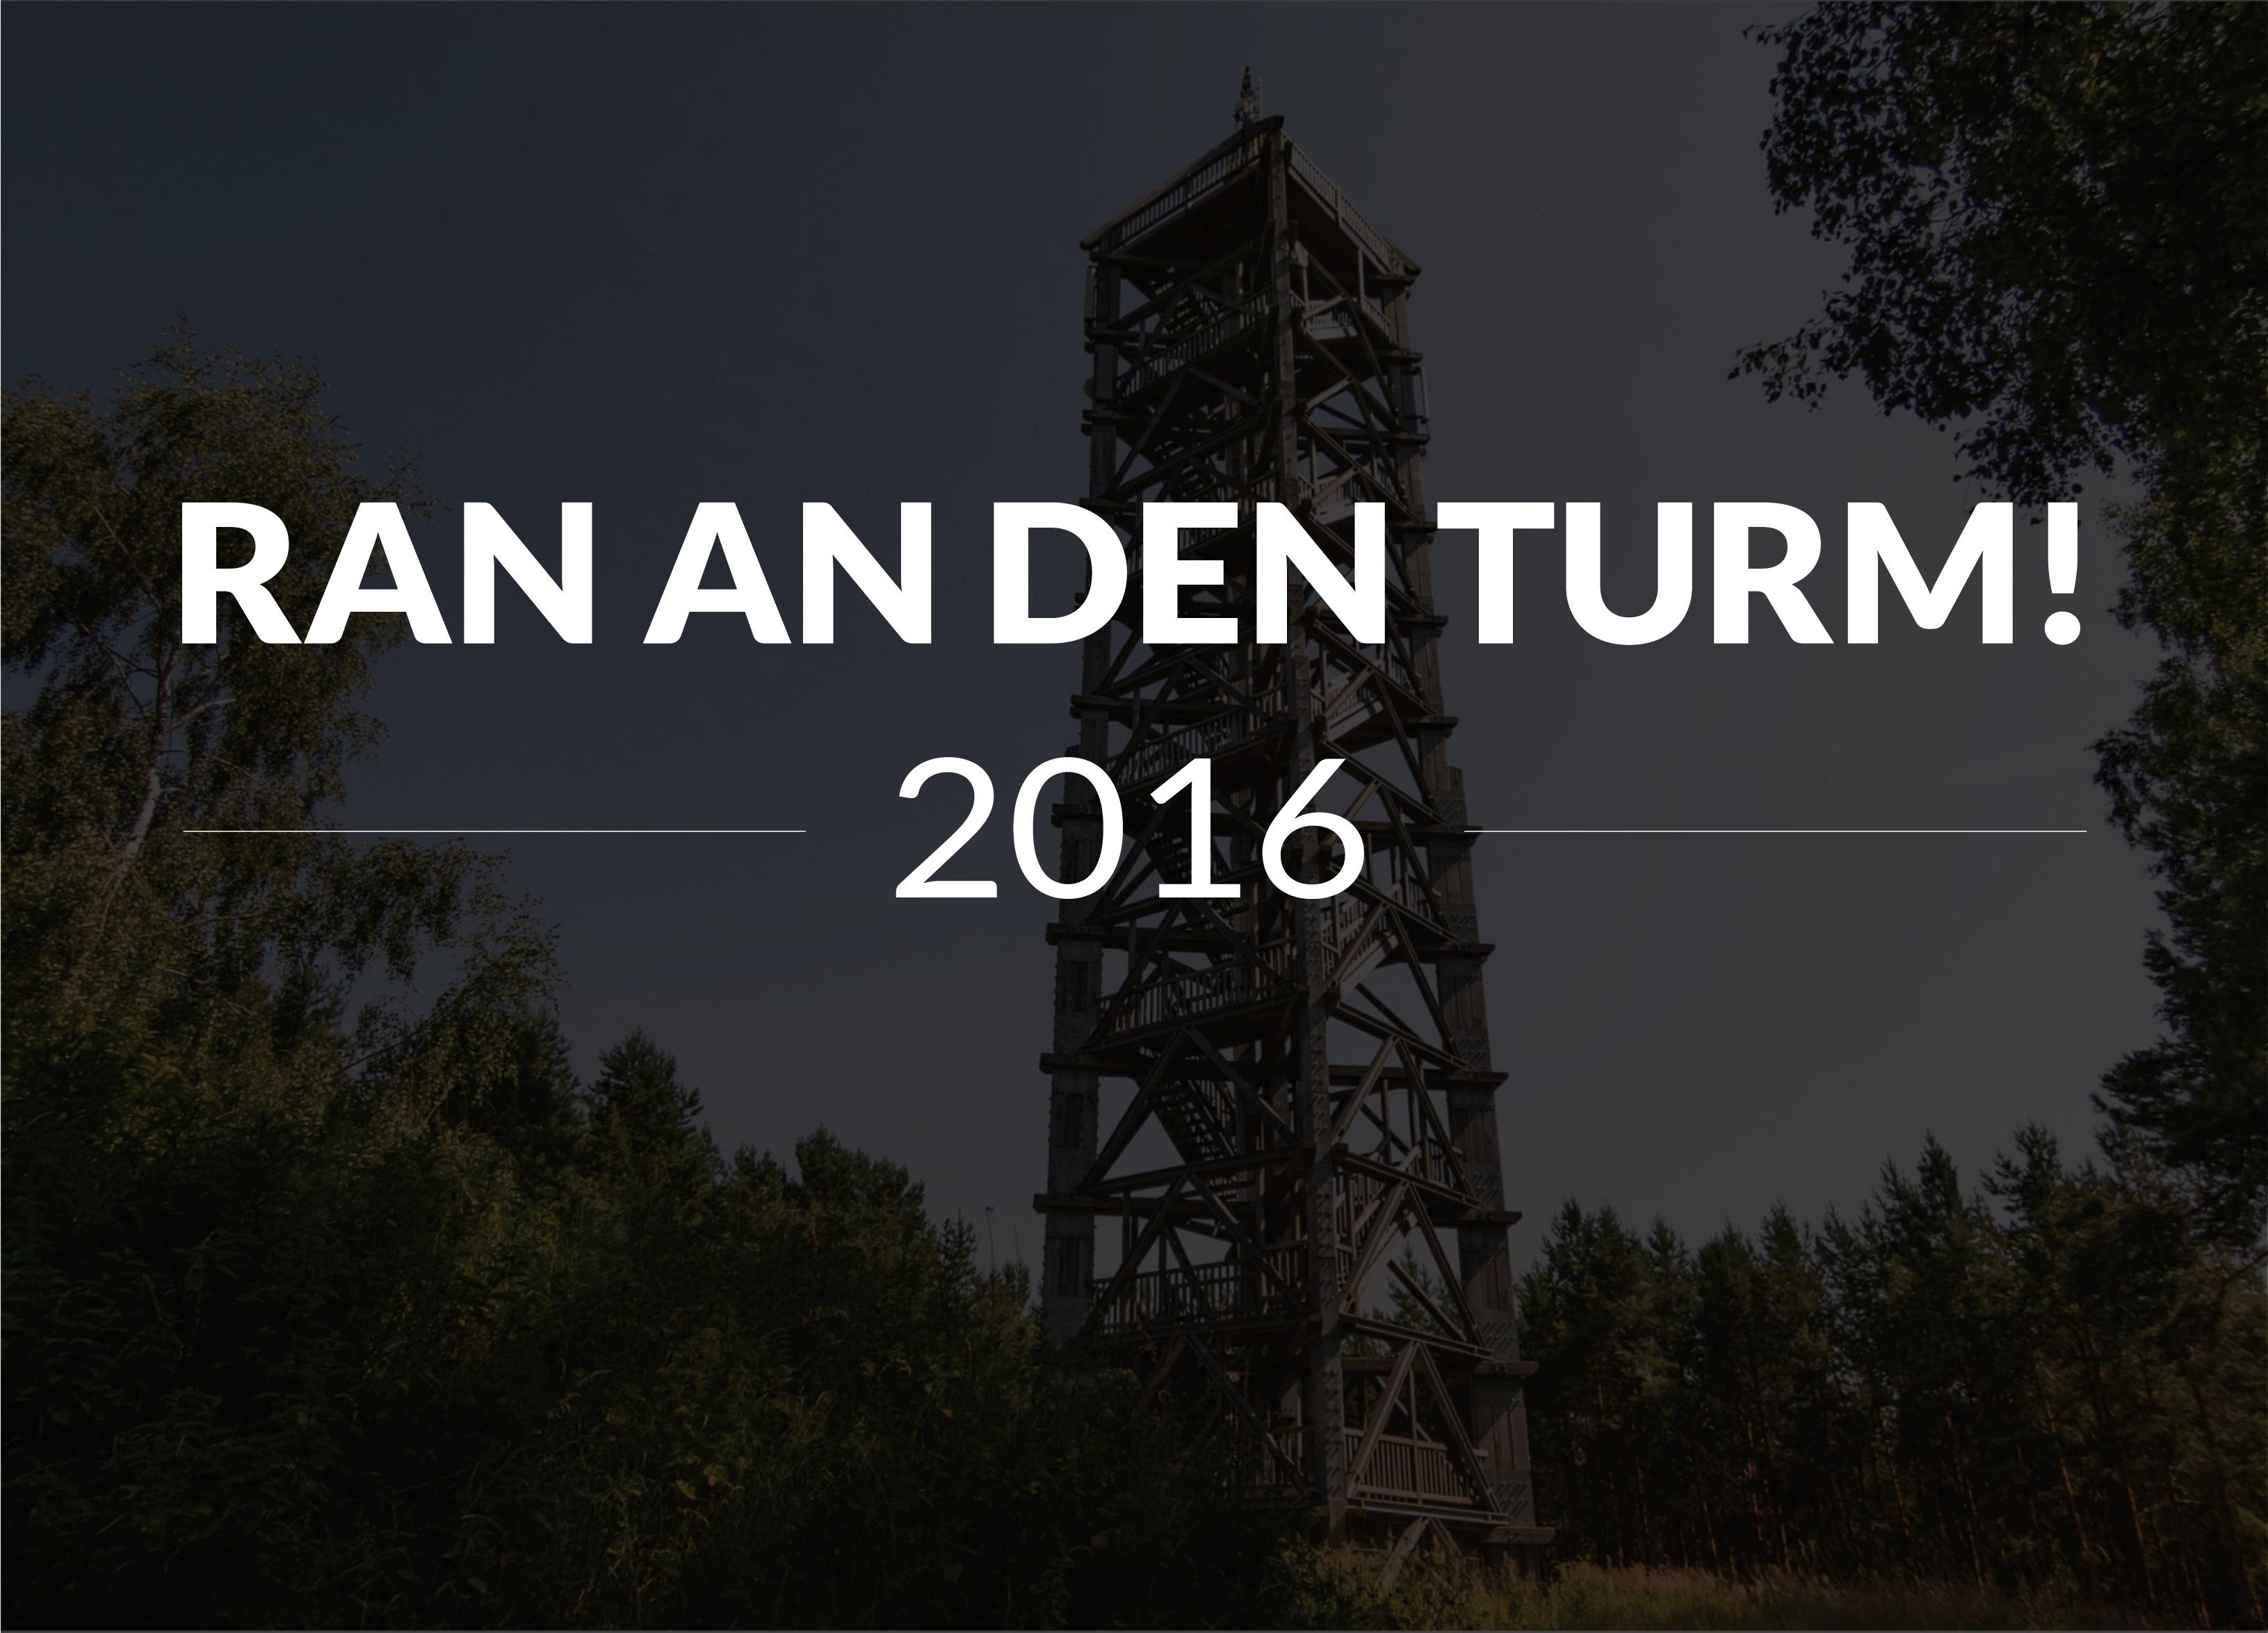 4.RAN AN DEN TURM 2016